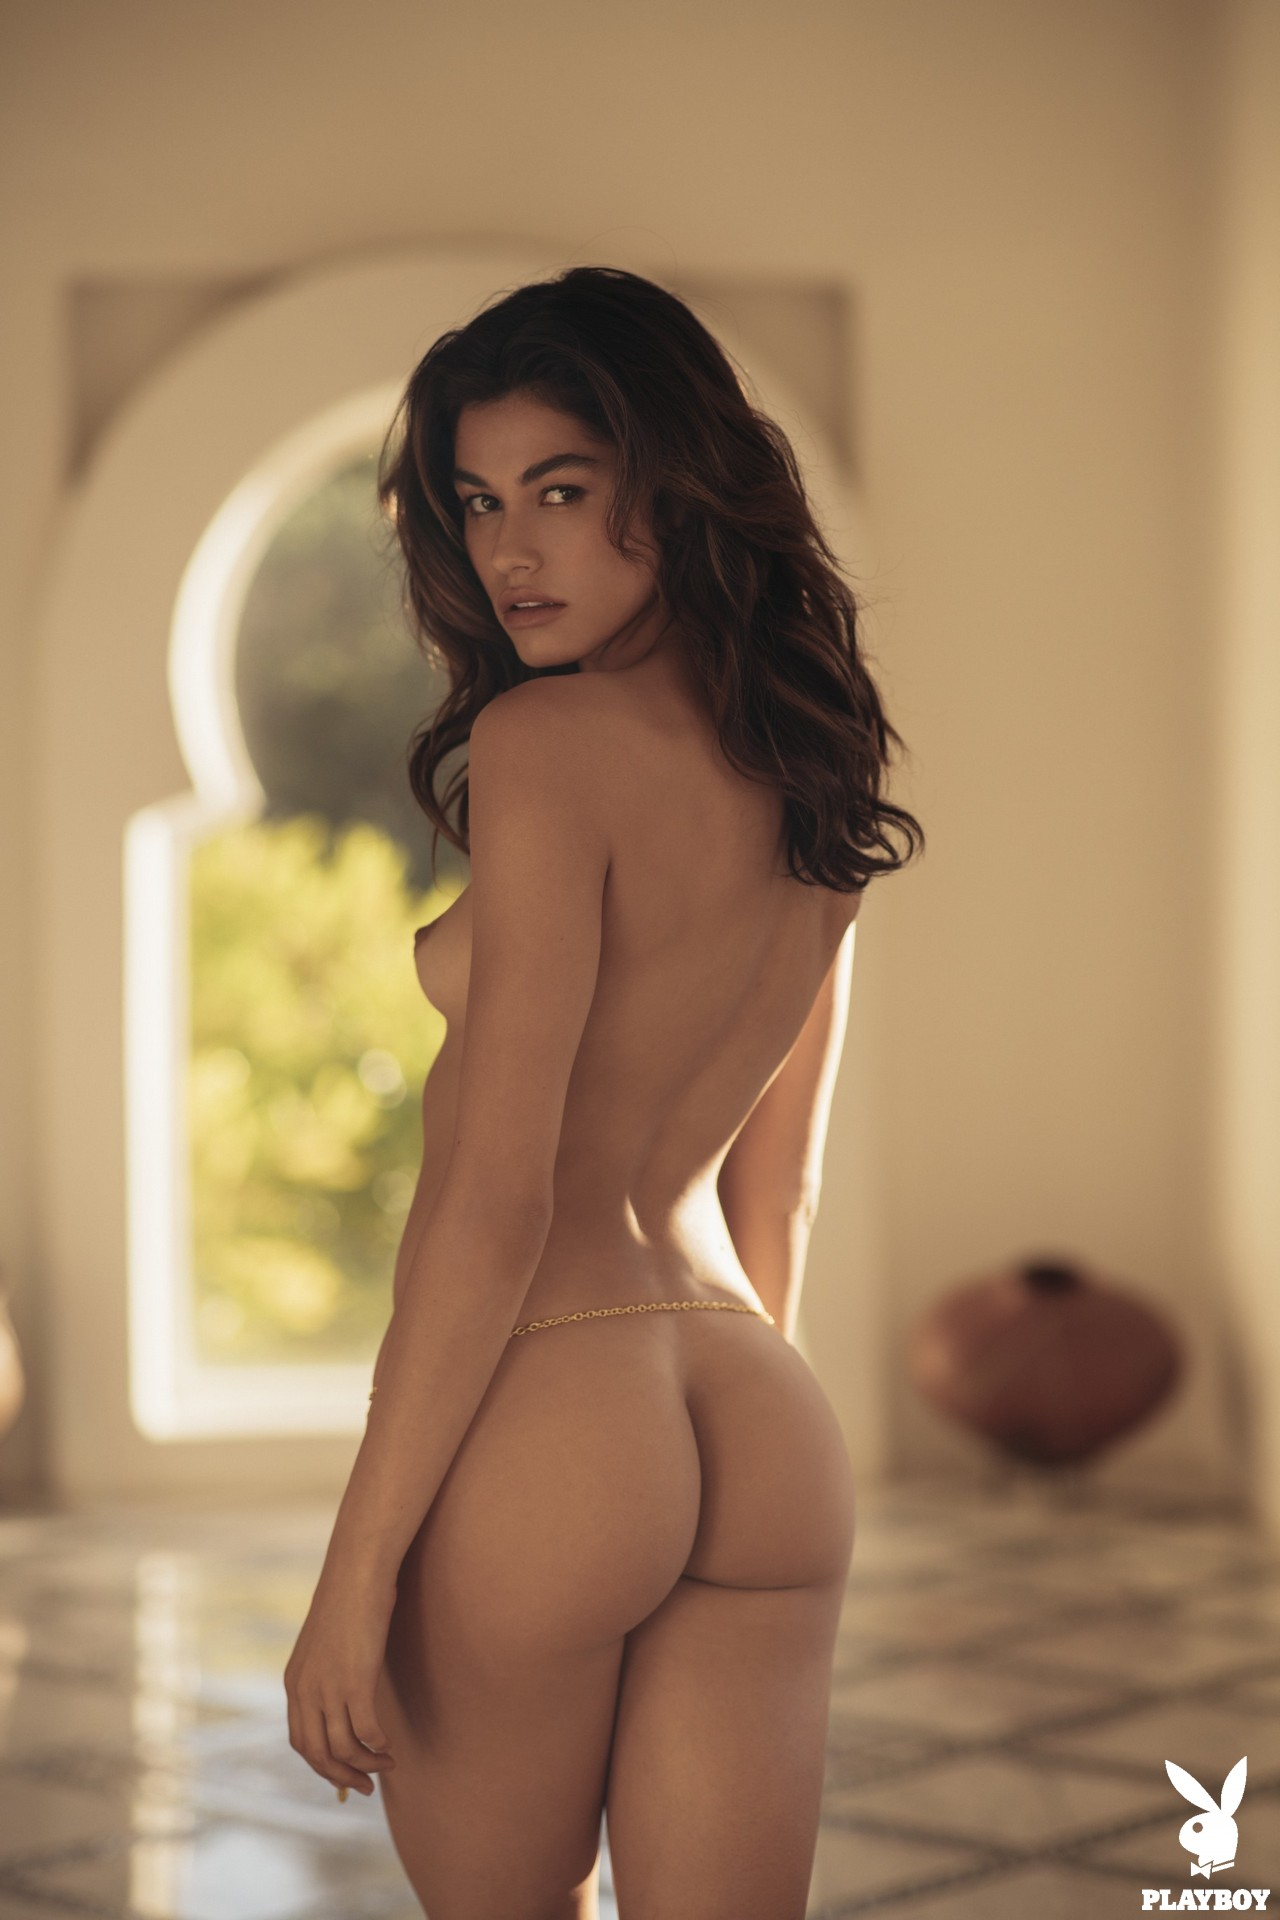 Playmate August 2018: Lorena Medina - Playboy Plus 12